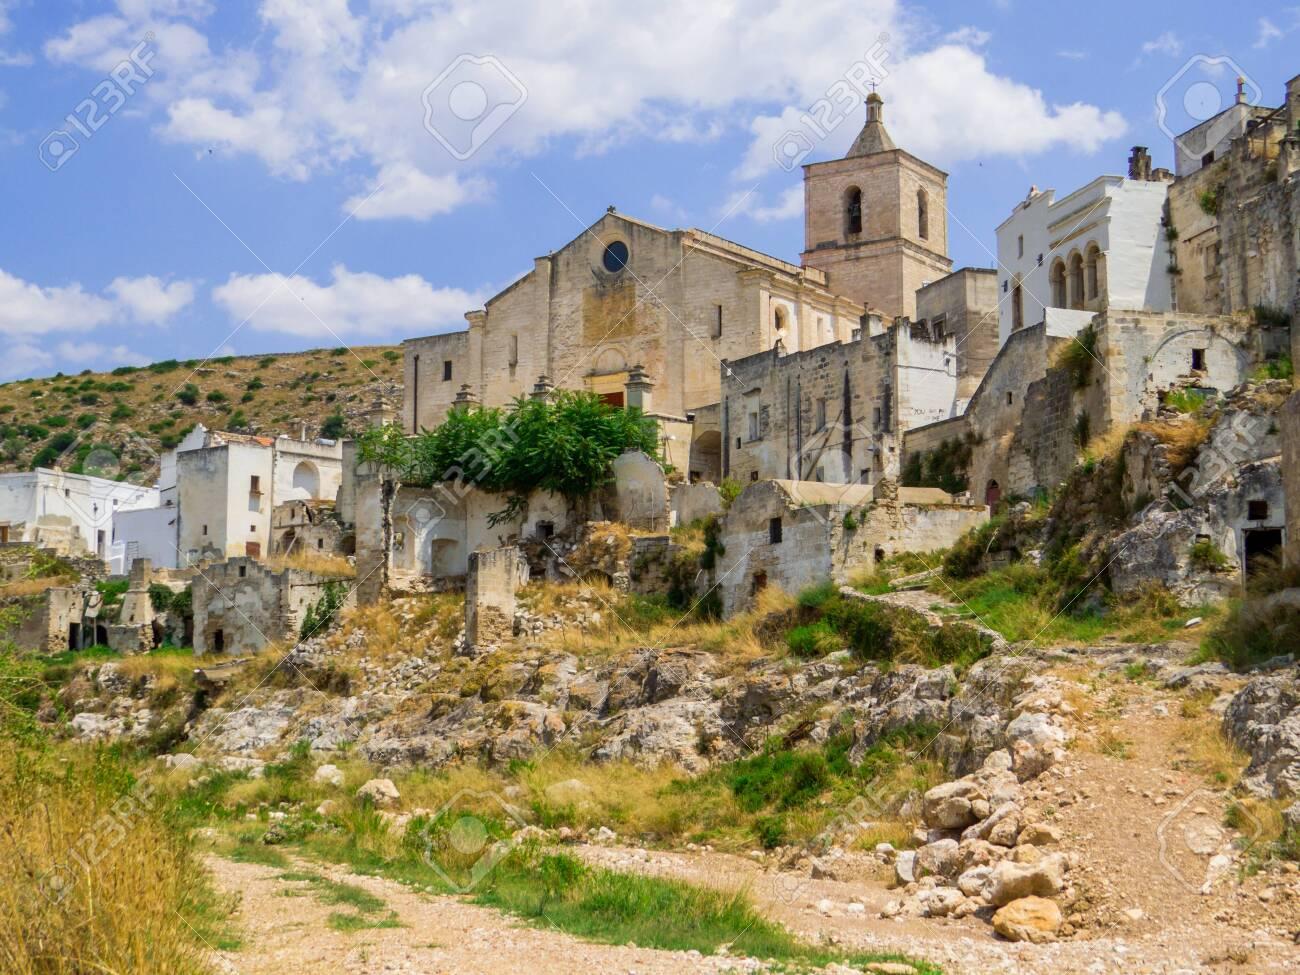 Ancient ruins in Ginosa, Apulia, south Italy - 151513382